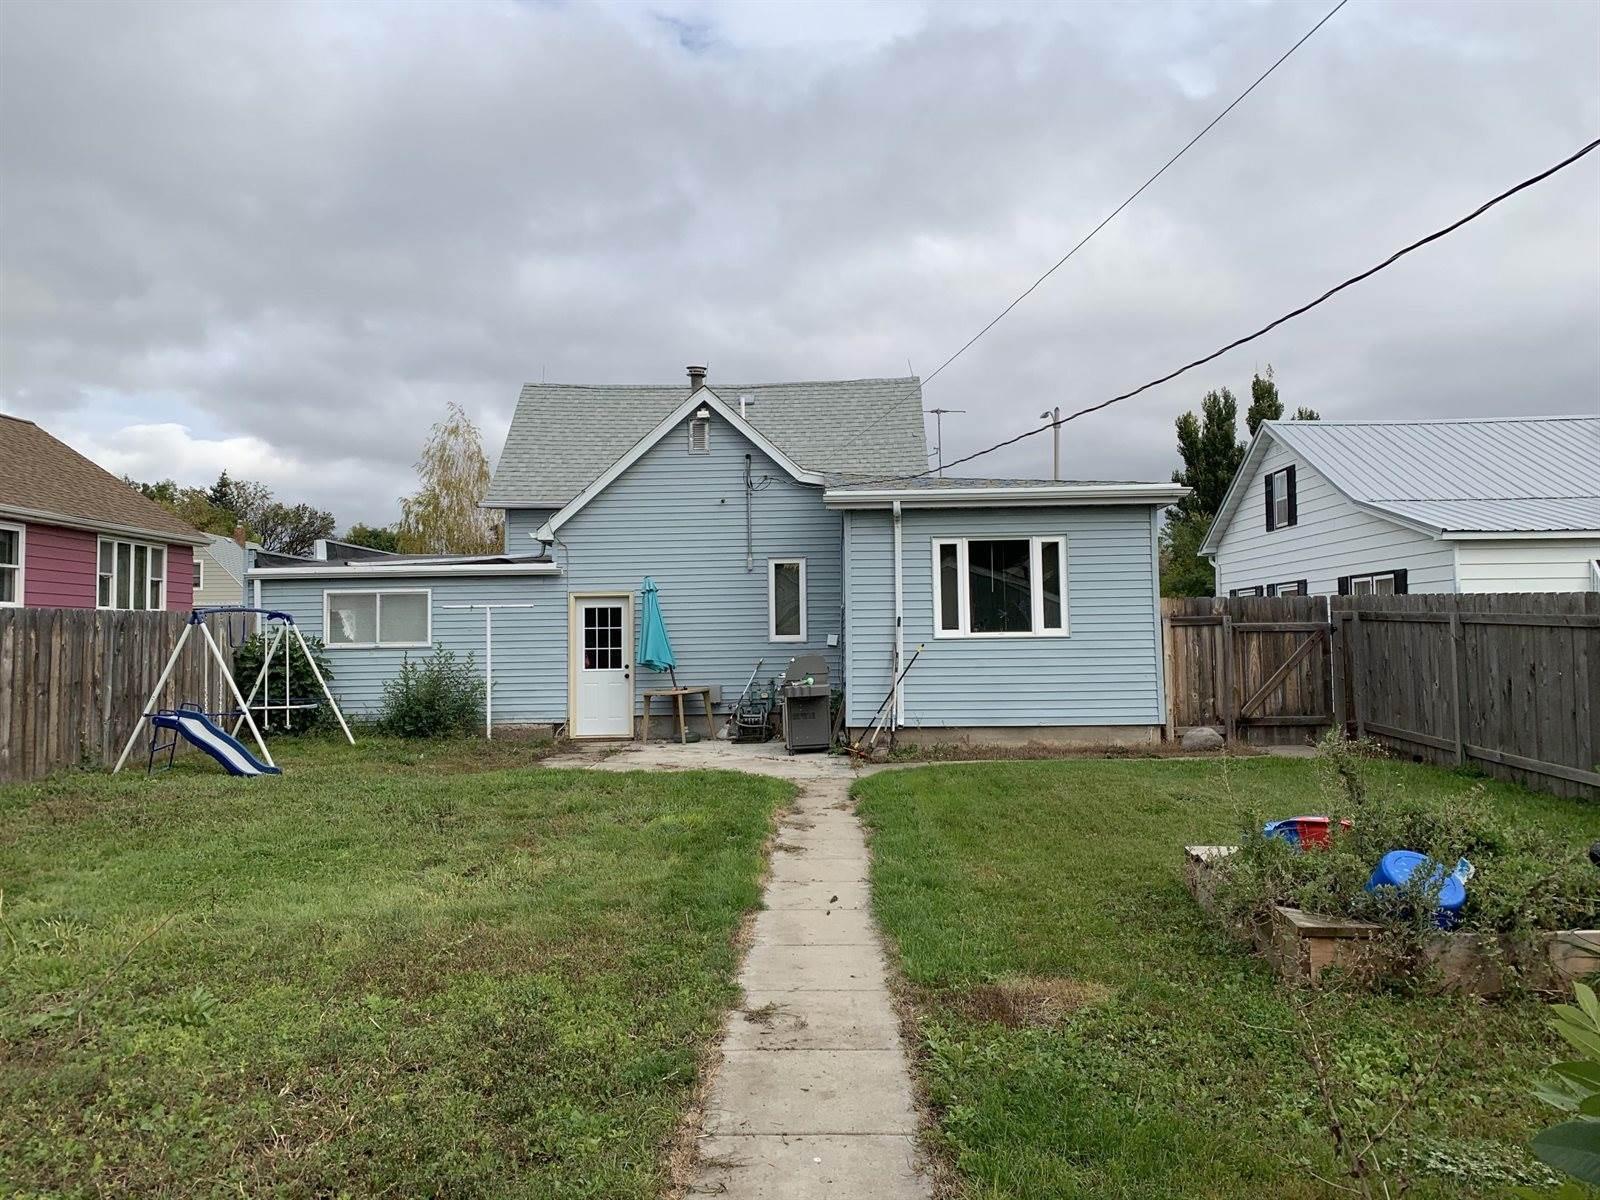 915 4th Ave West, Williston, ND 58801